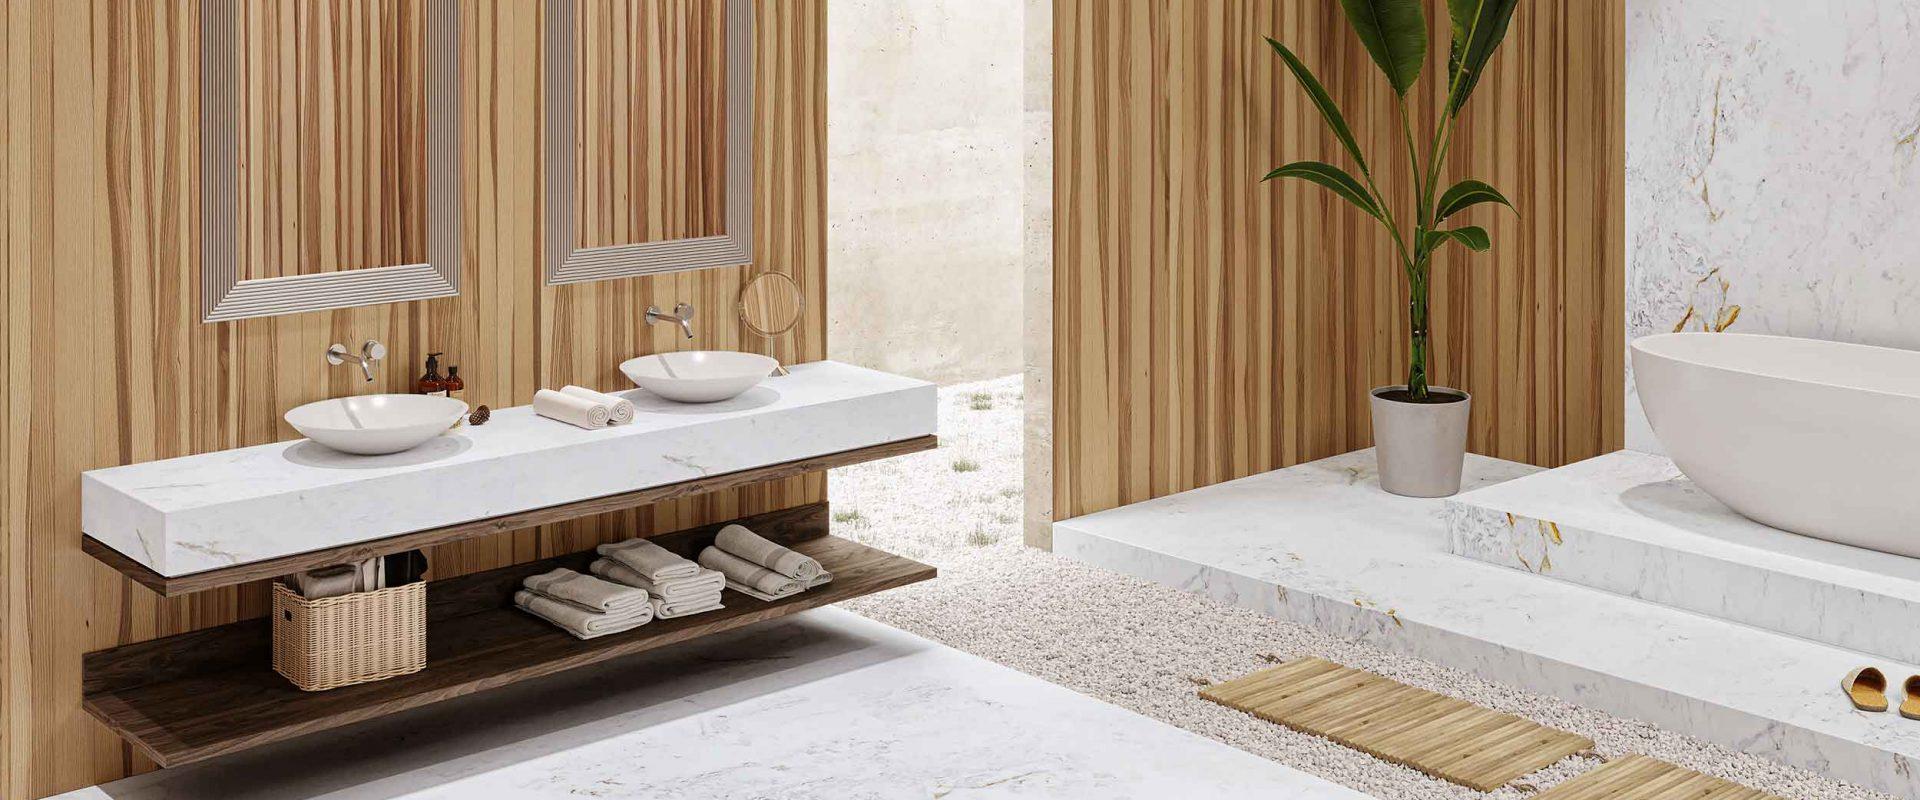 banheiro-calacatta-columbus-02